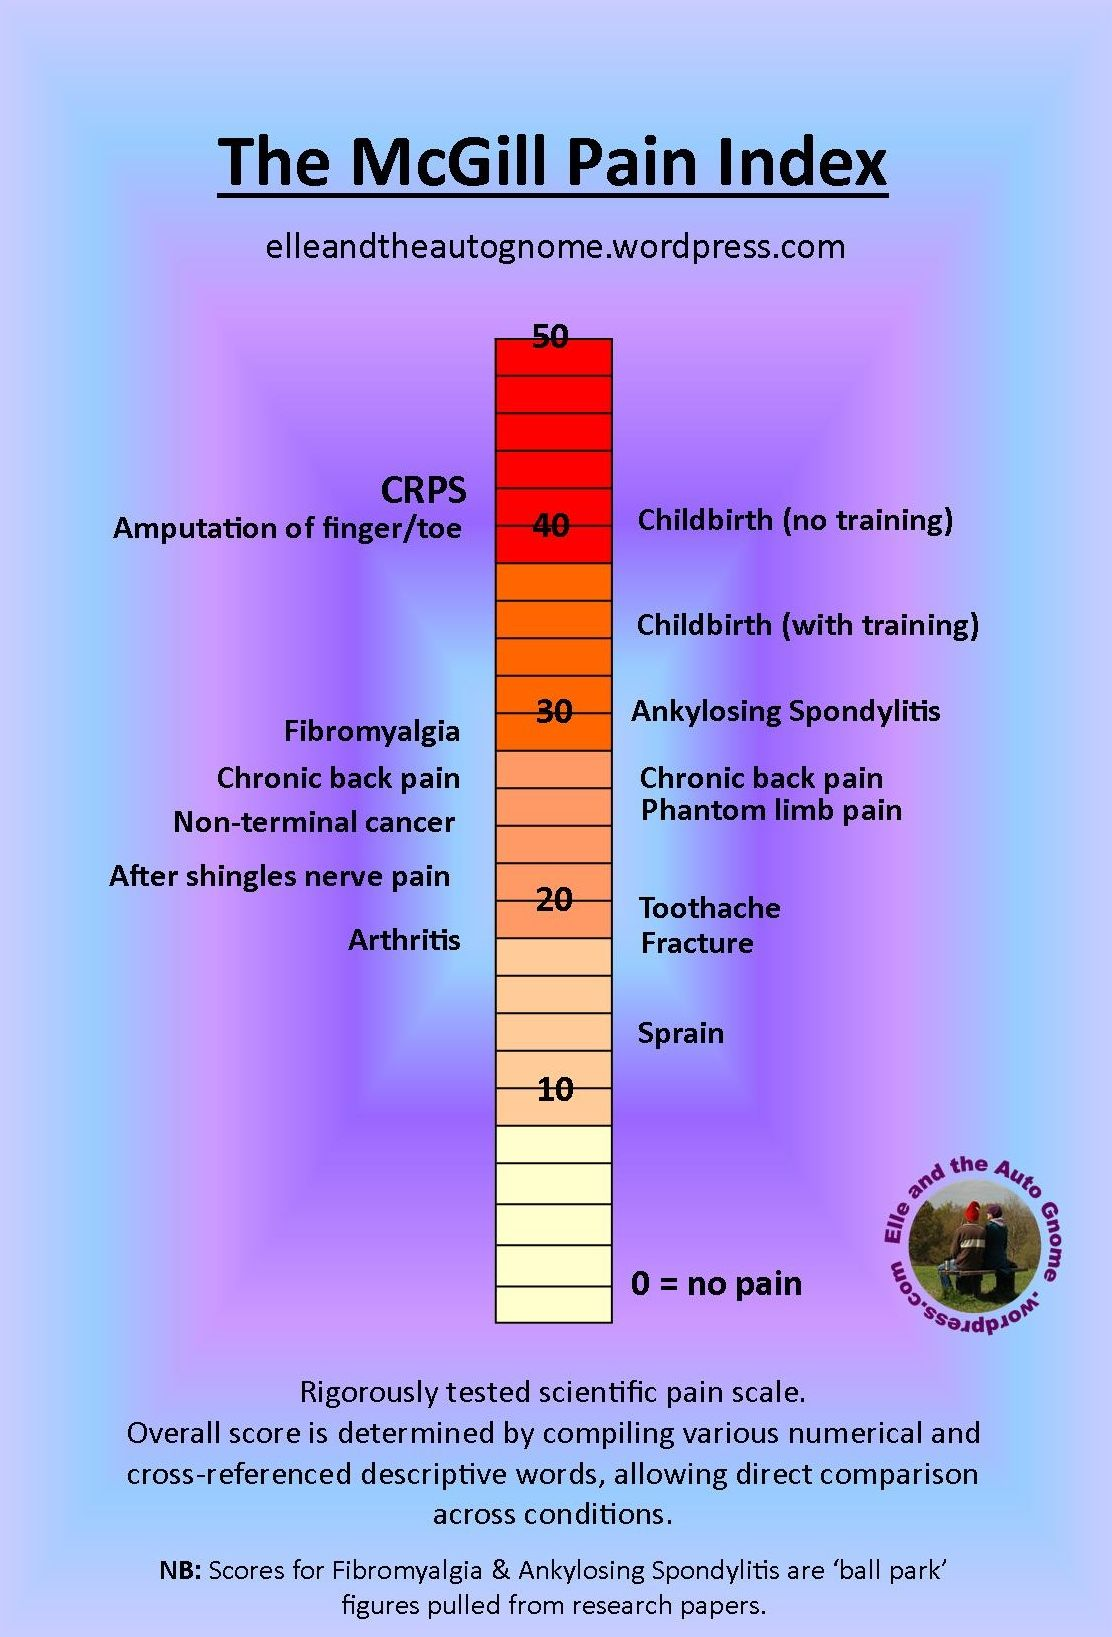 Ankylosing Spondylitis On The Mcgill Pain Scale